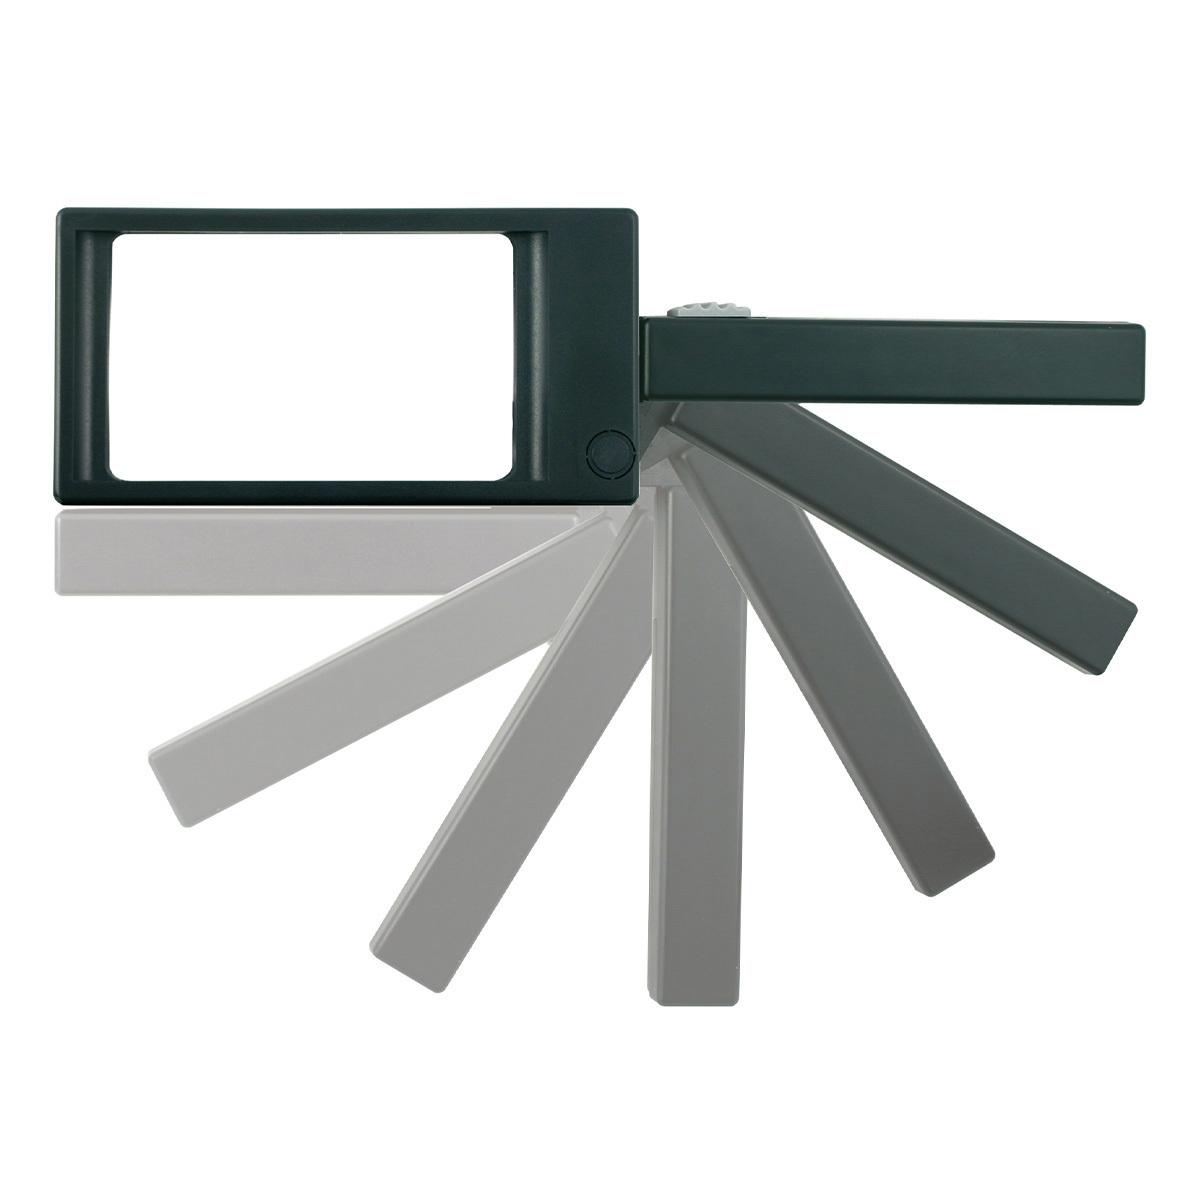 43-3006-handlupe-mit-beleuchtung-anwendung-1200x1200px.jpg